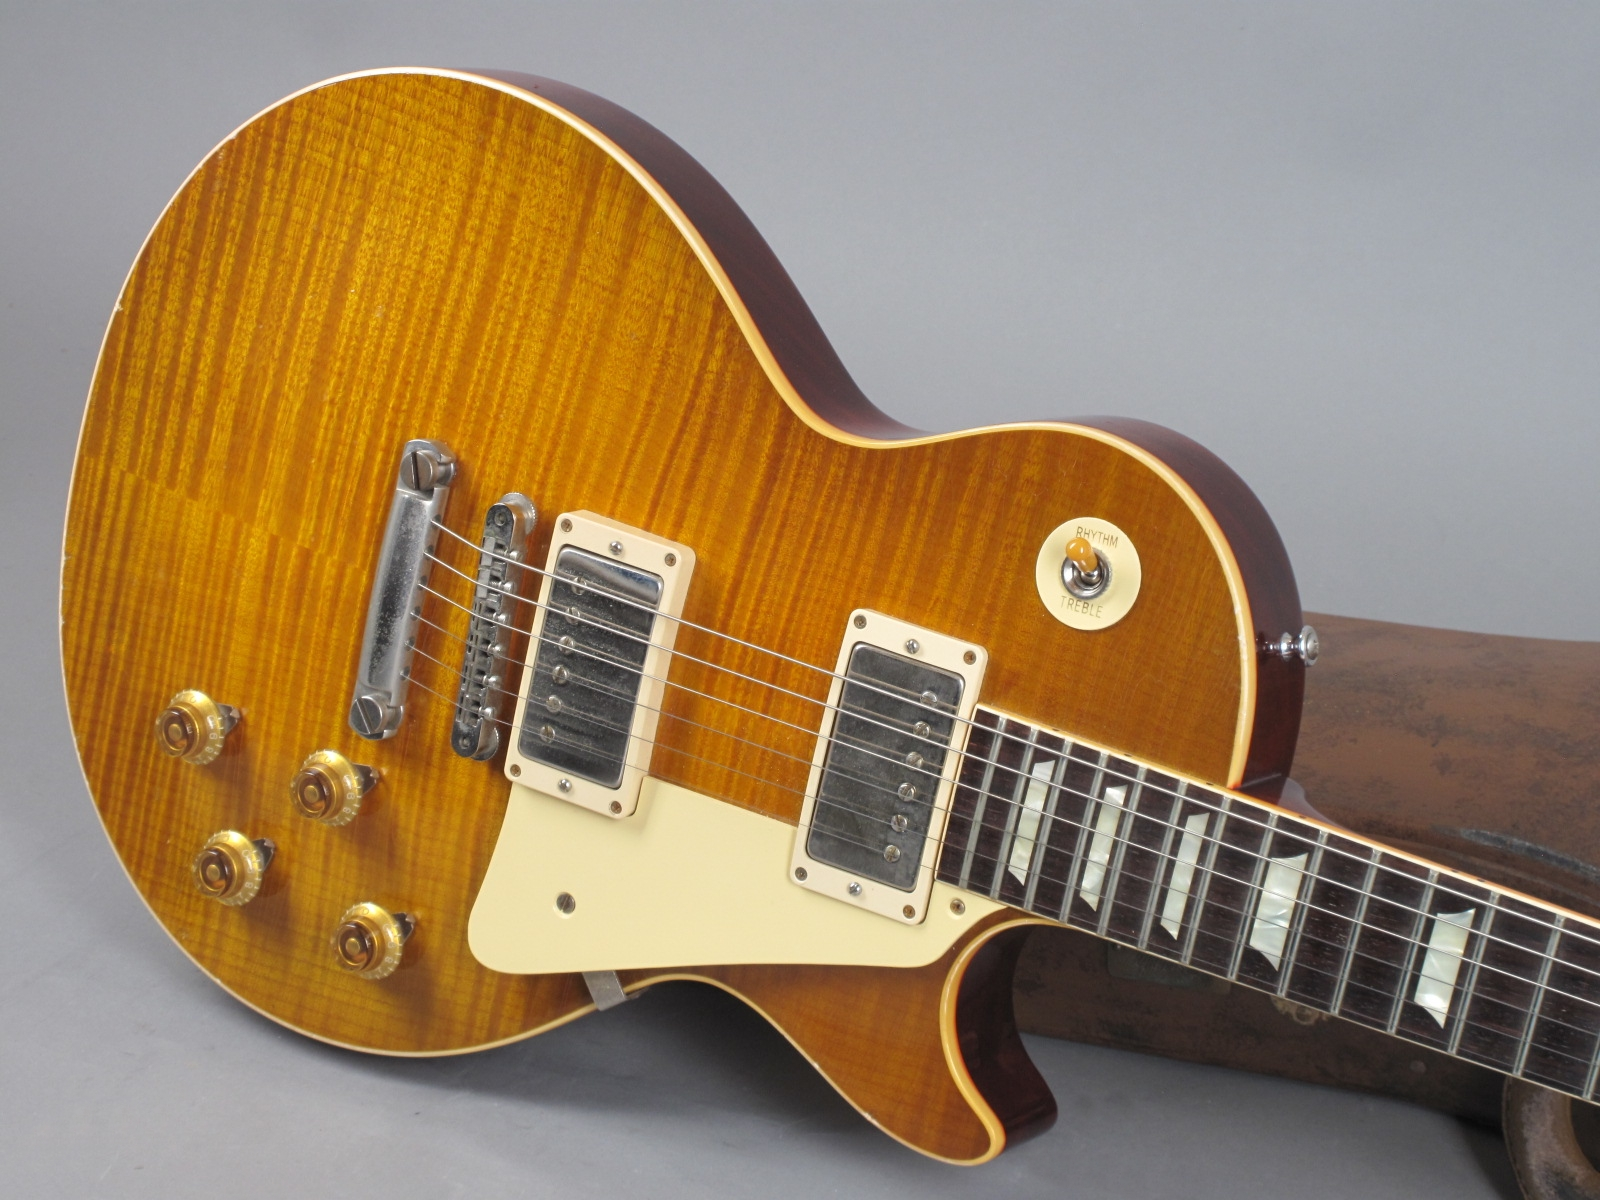 https://guitarpoint.de/app/uploads/products/2016-gibson-les-paul-1959-true-historic-murphy-aged/2016-Gibson-Les-Paul-1959-Murphy-Aged-96431_19.jpg